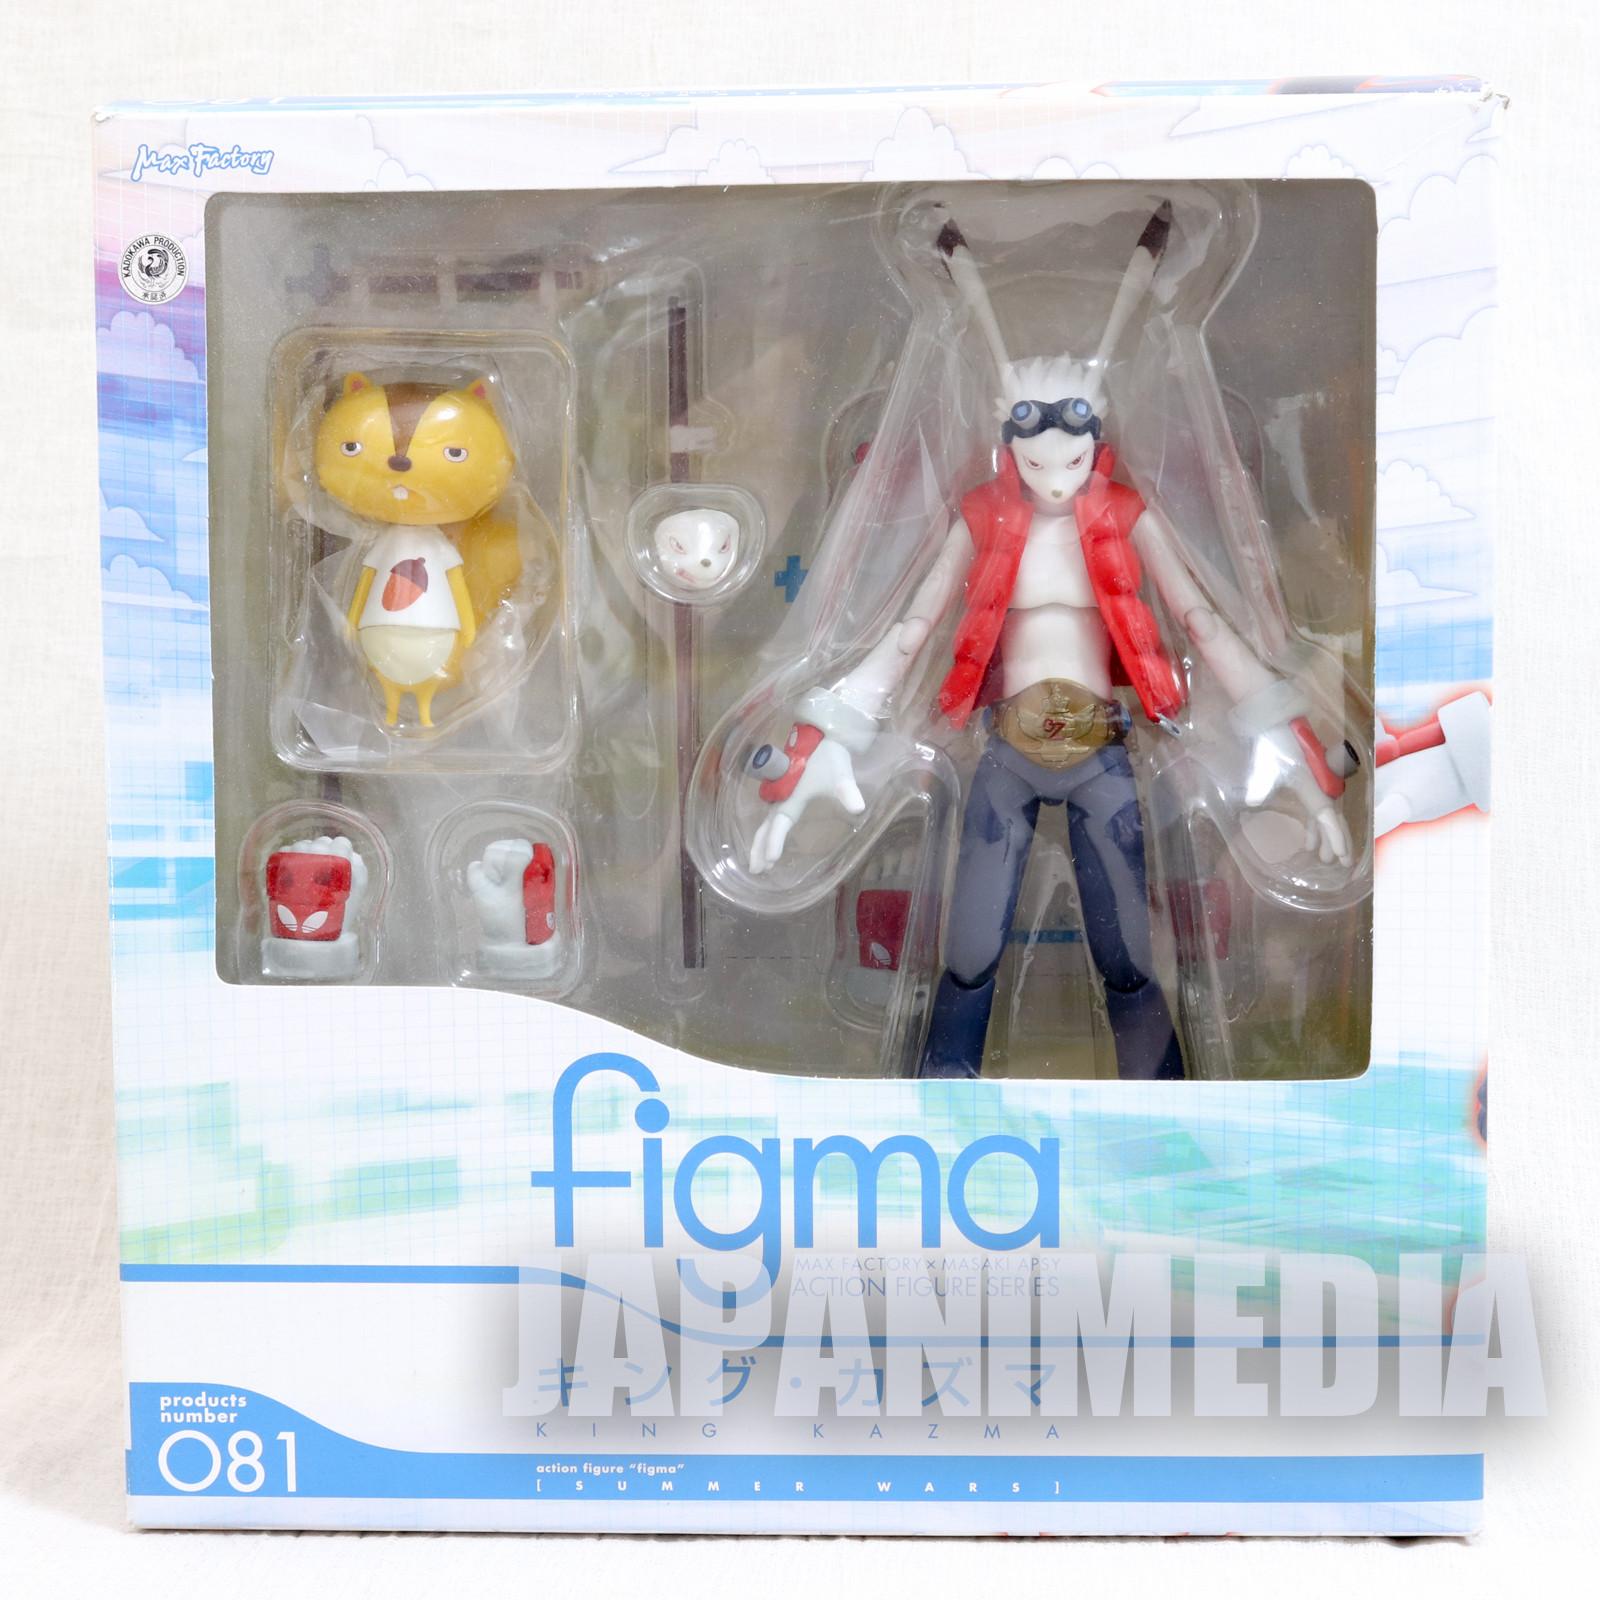 Summer Wars King kazuma Figma Action Figure 081 Max Factory JAPAN